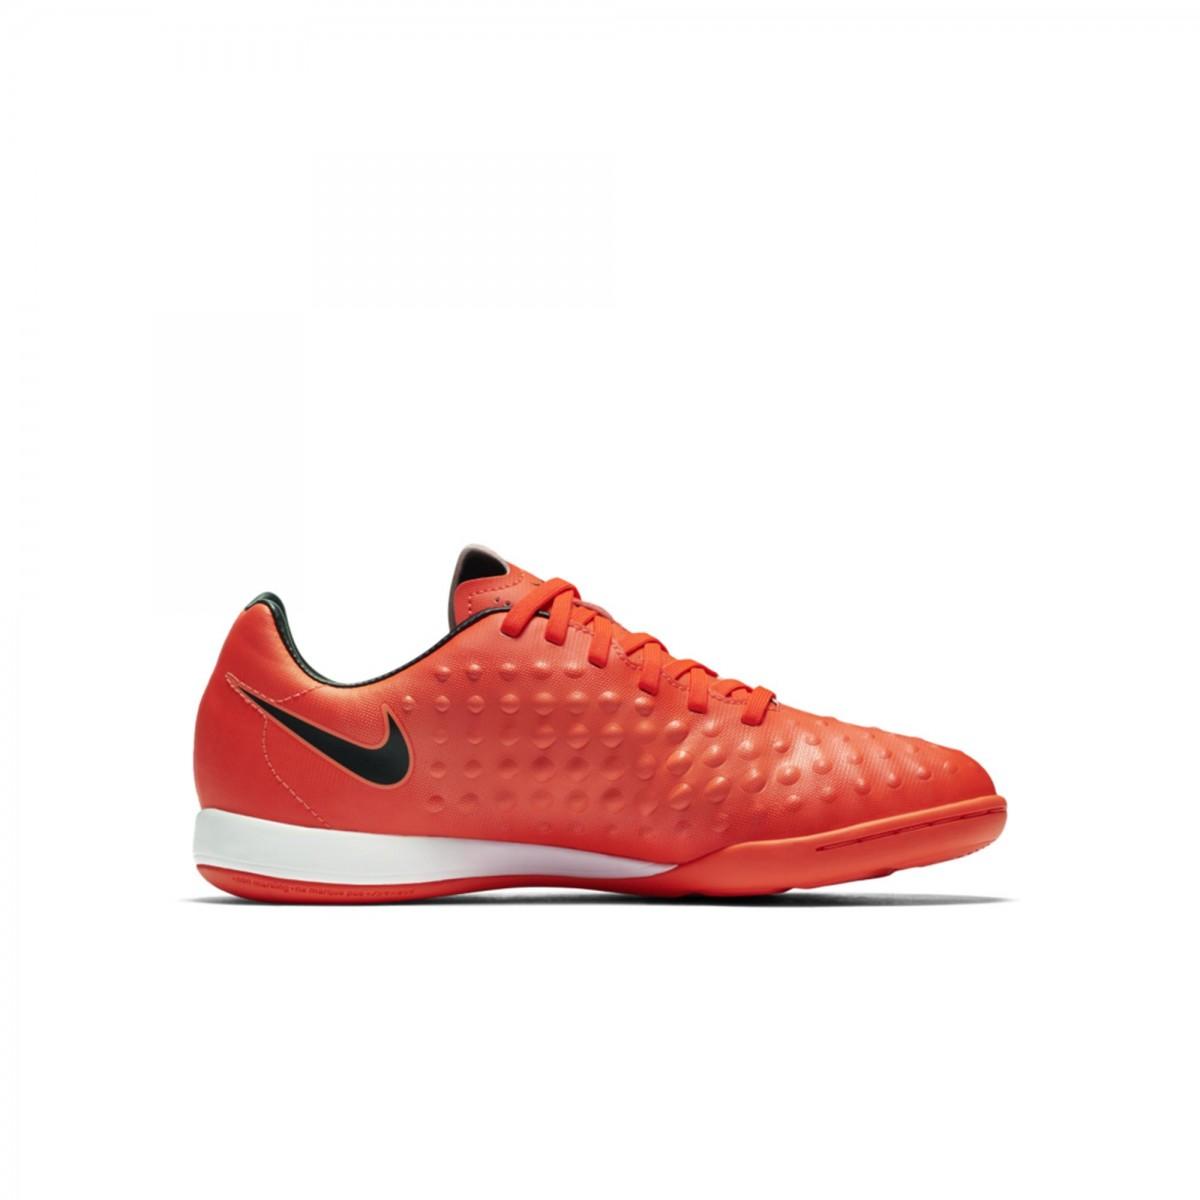 916e888896 Bizz Store - Chuteira Futsal Infantil Nike MagistaX Opus II JR